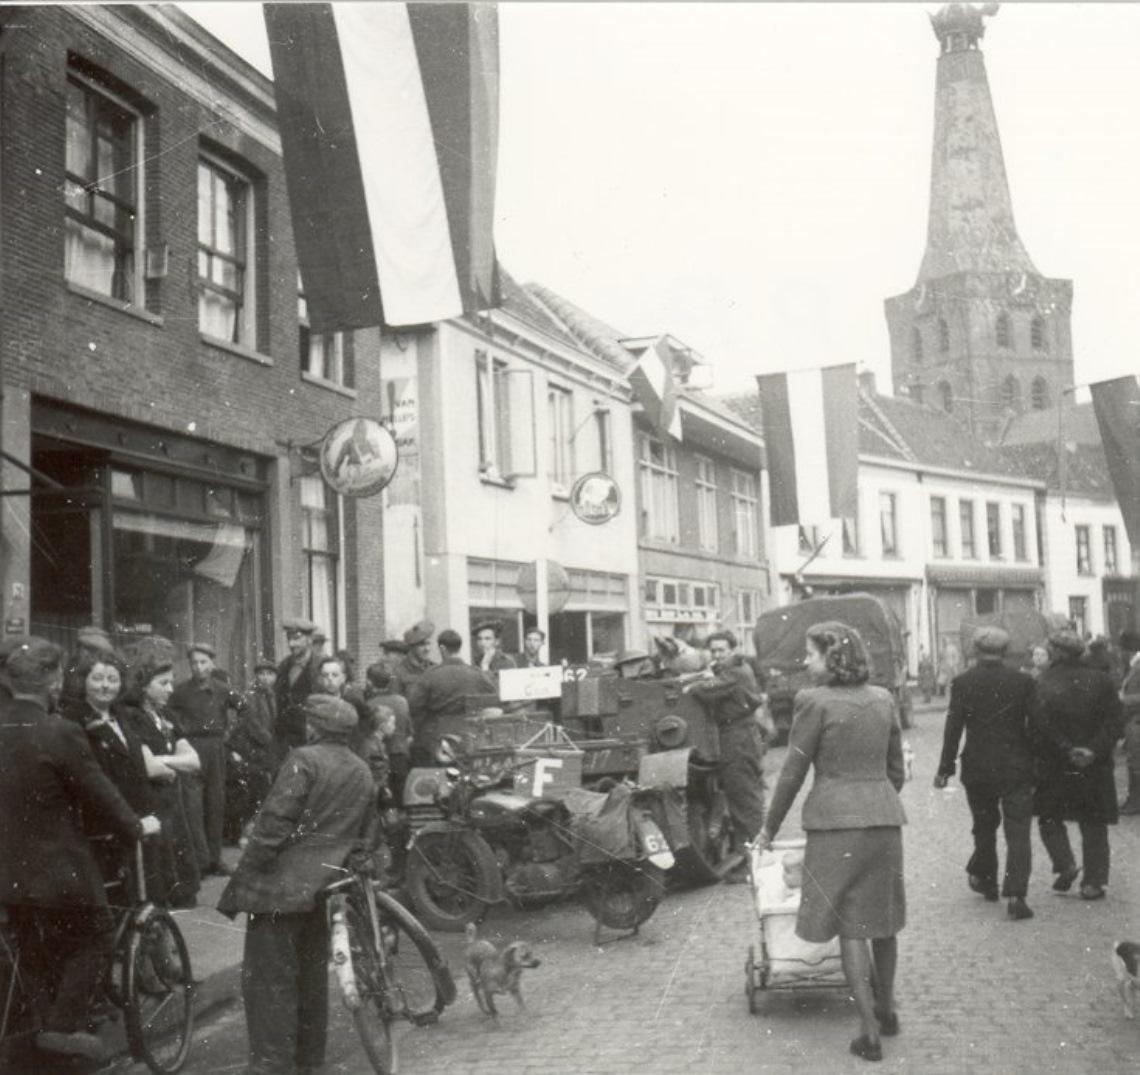 Gemeentearchief Barneveld